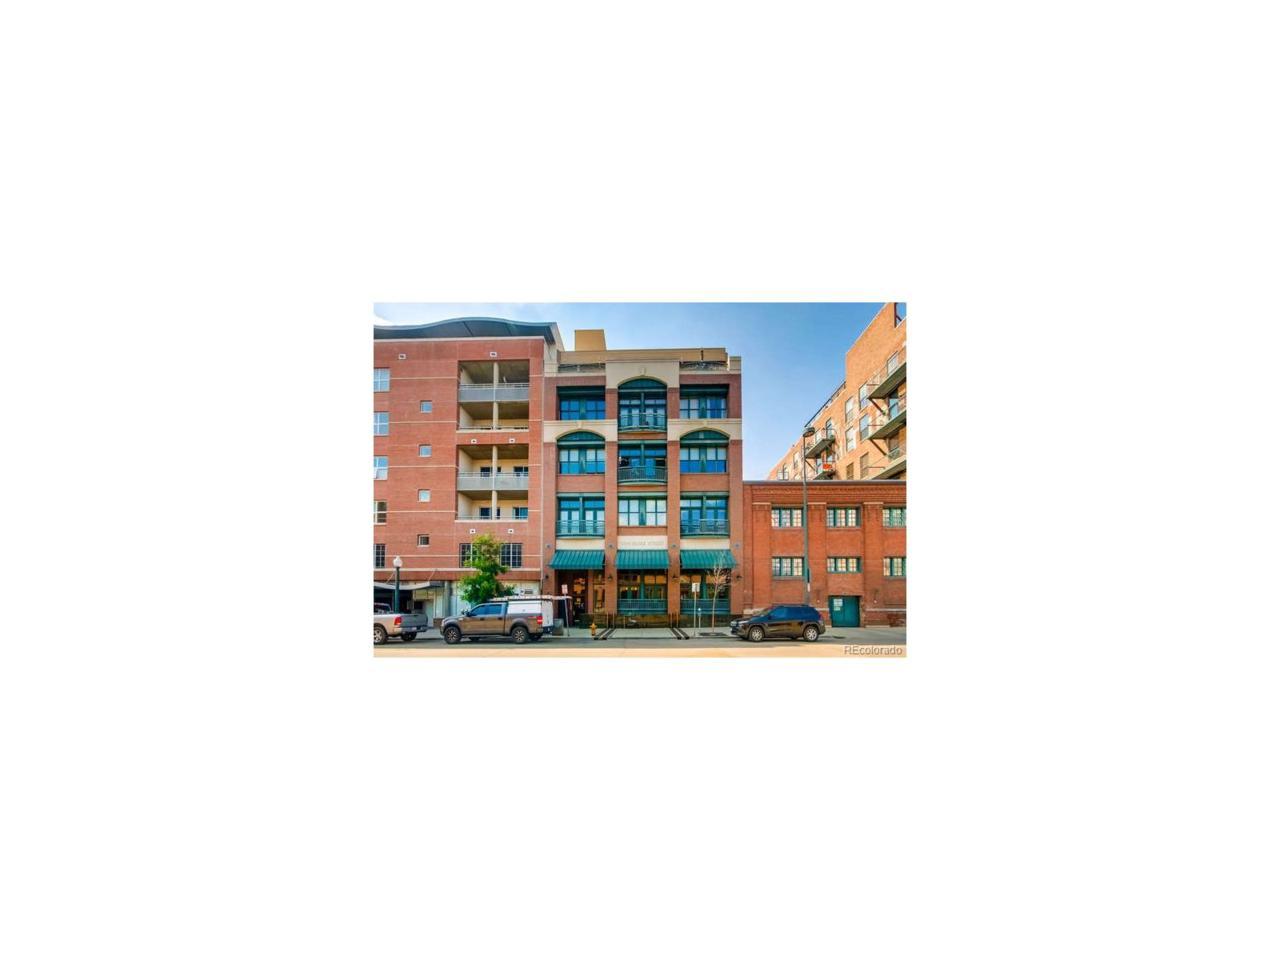 2245 Blake Street A, Denver, CO 80205 (MLS #4416778) :: 8z Real Estate